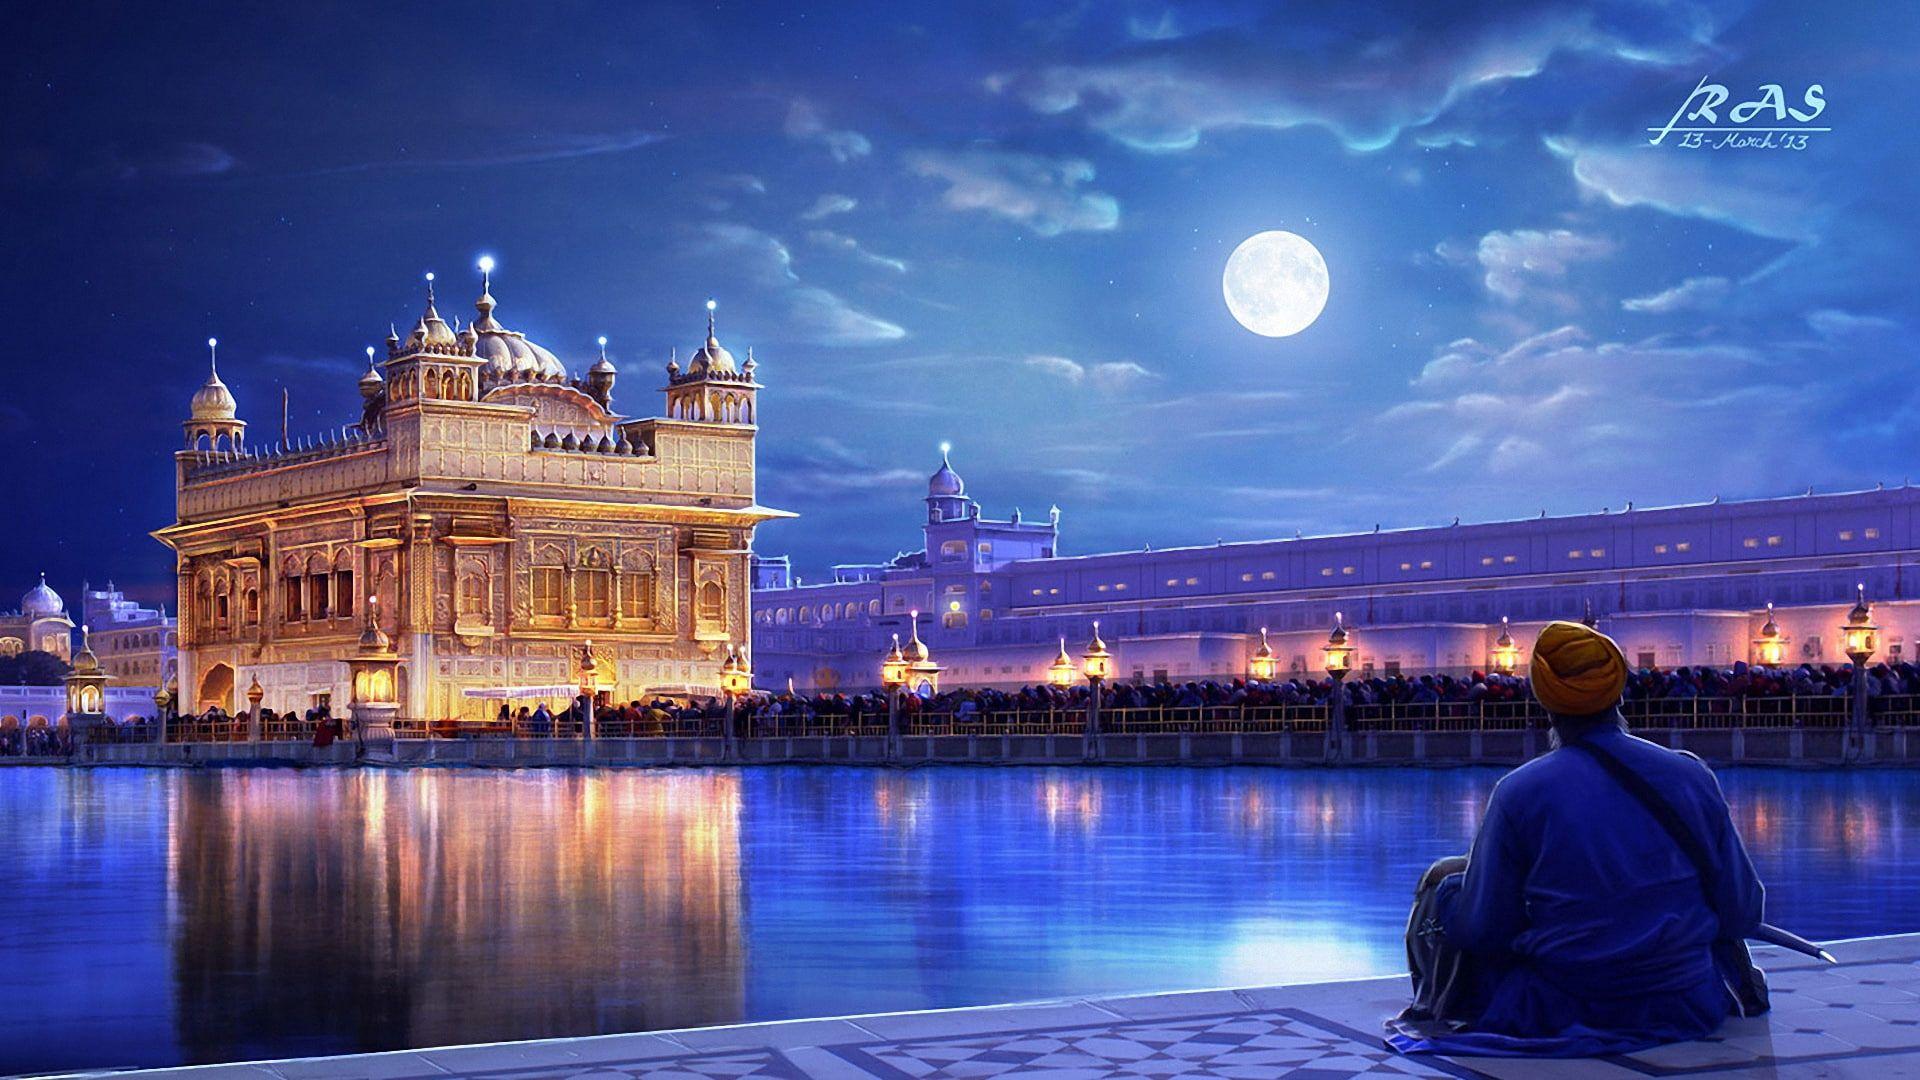 Golden Temple Amritsar Punjab India Hd World Travel Travel And World Golden Temple India Punjab Amri Hd Wallpaper World Wallpaper Golden Temple Amritsar Desktop golden temple hd wallpaper for